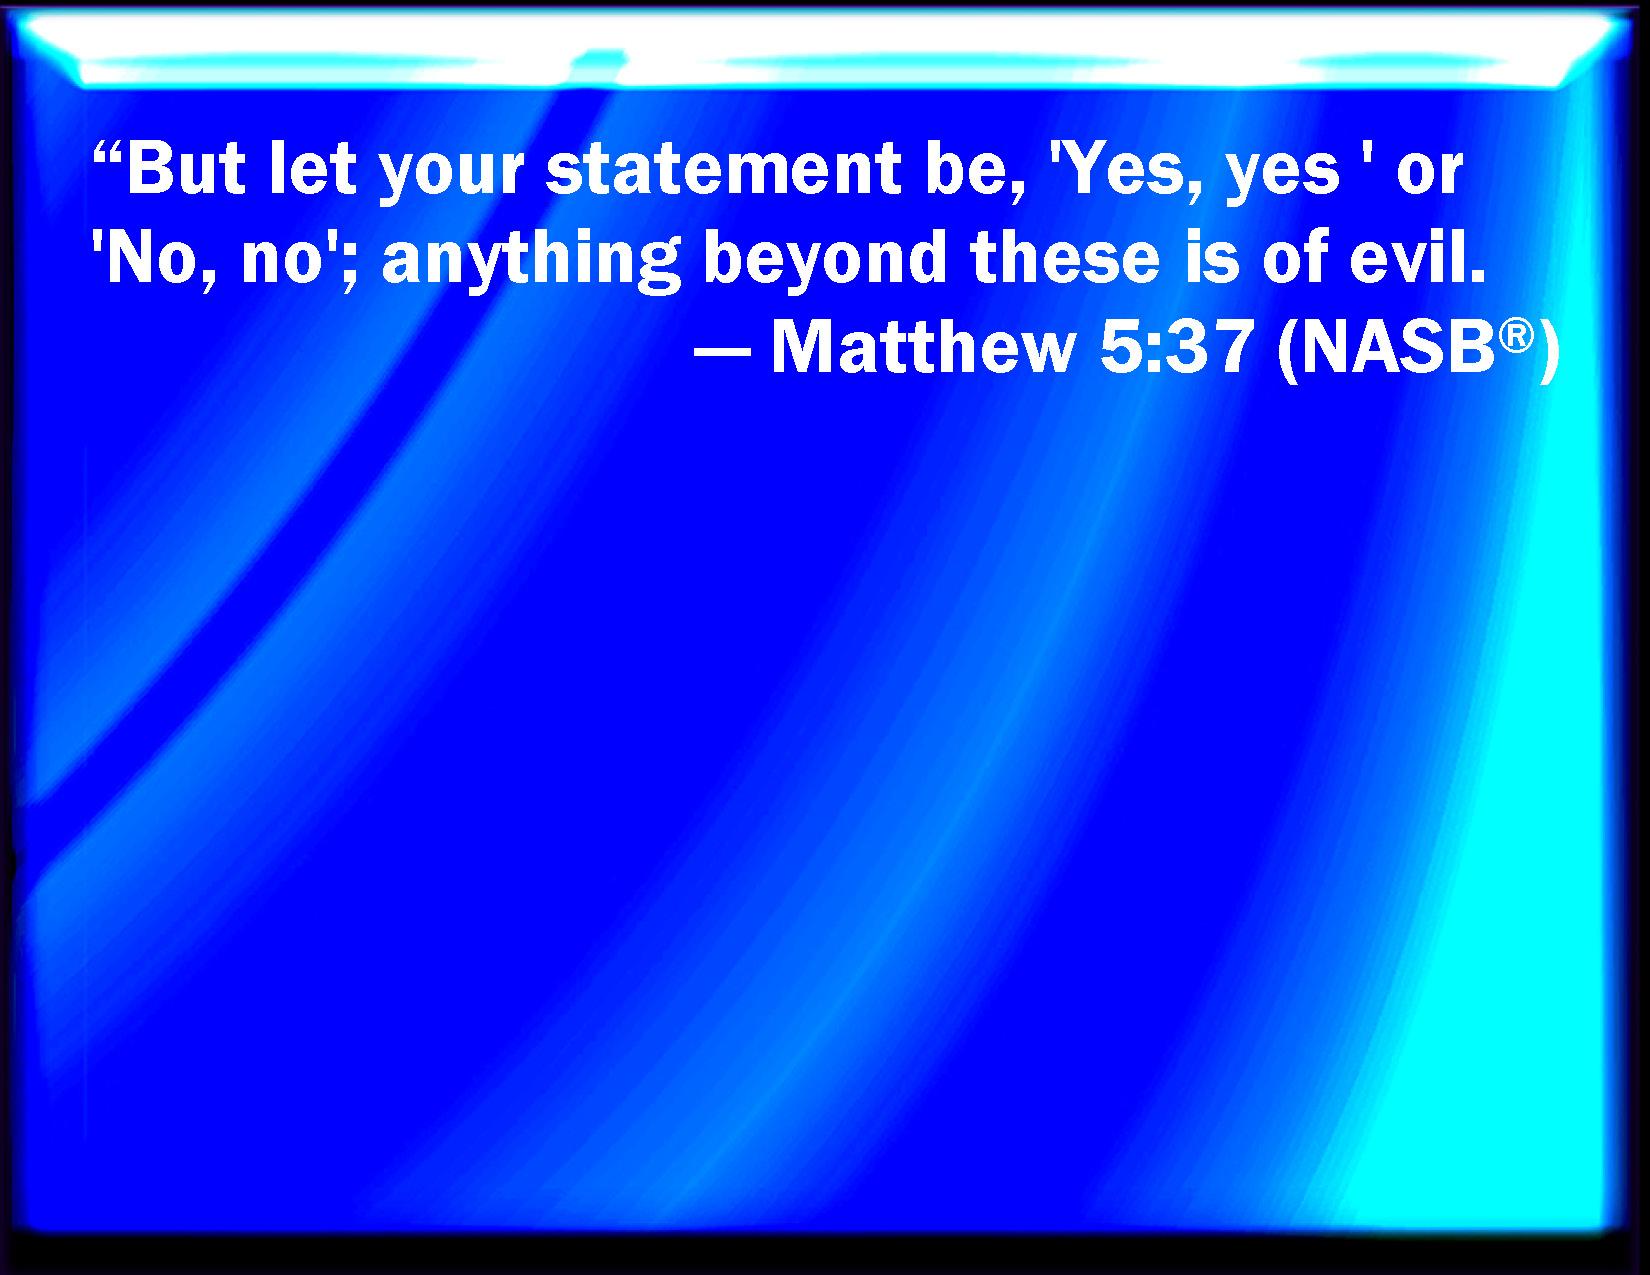 The Divorce 'Exception' Clauses in Matthew's Gospel